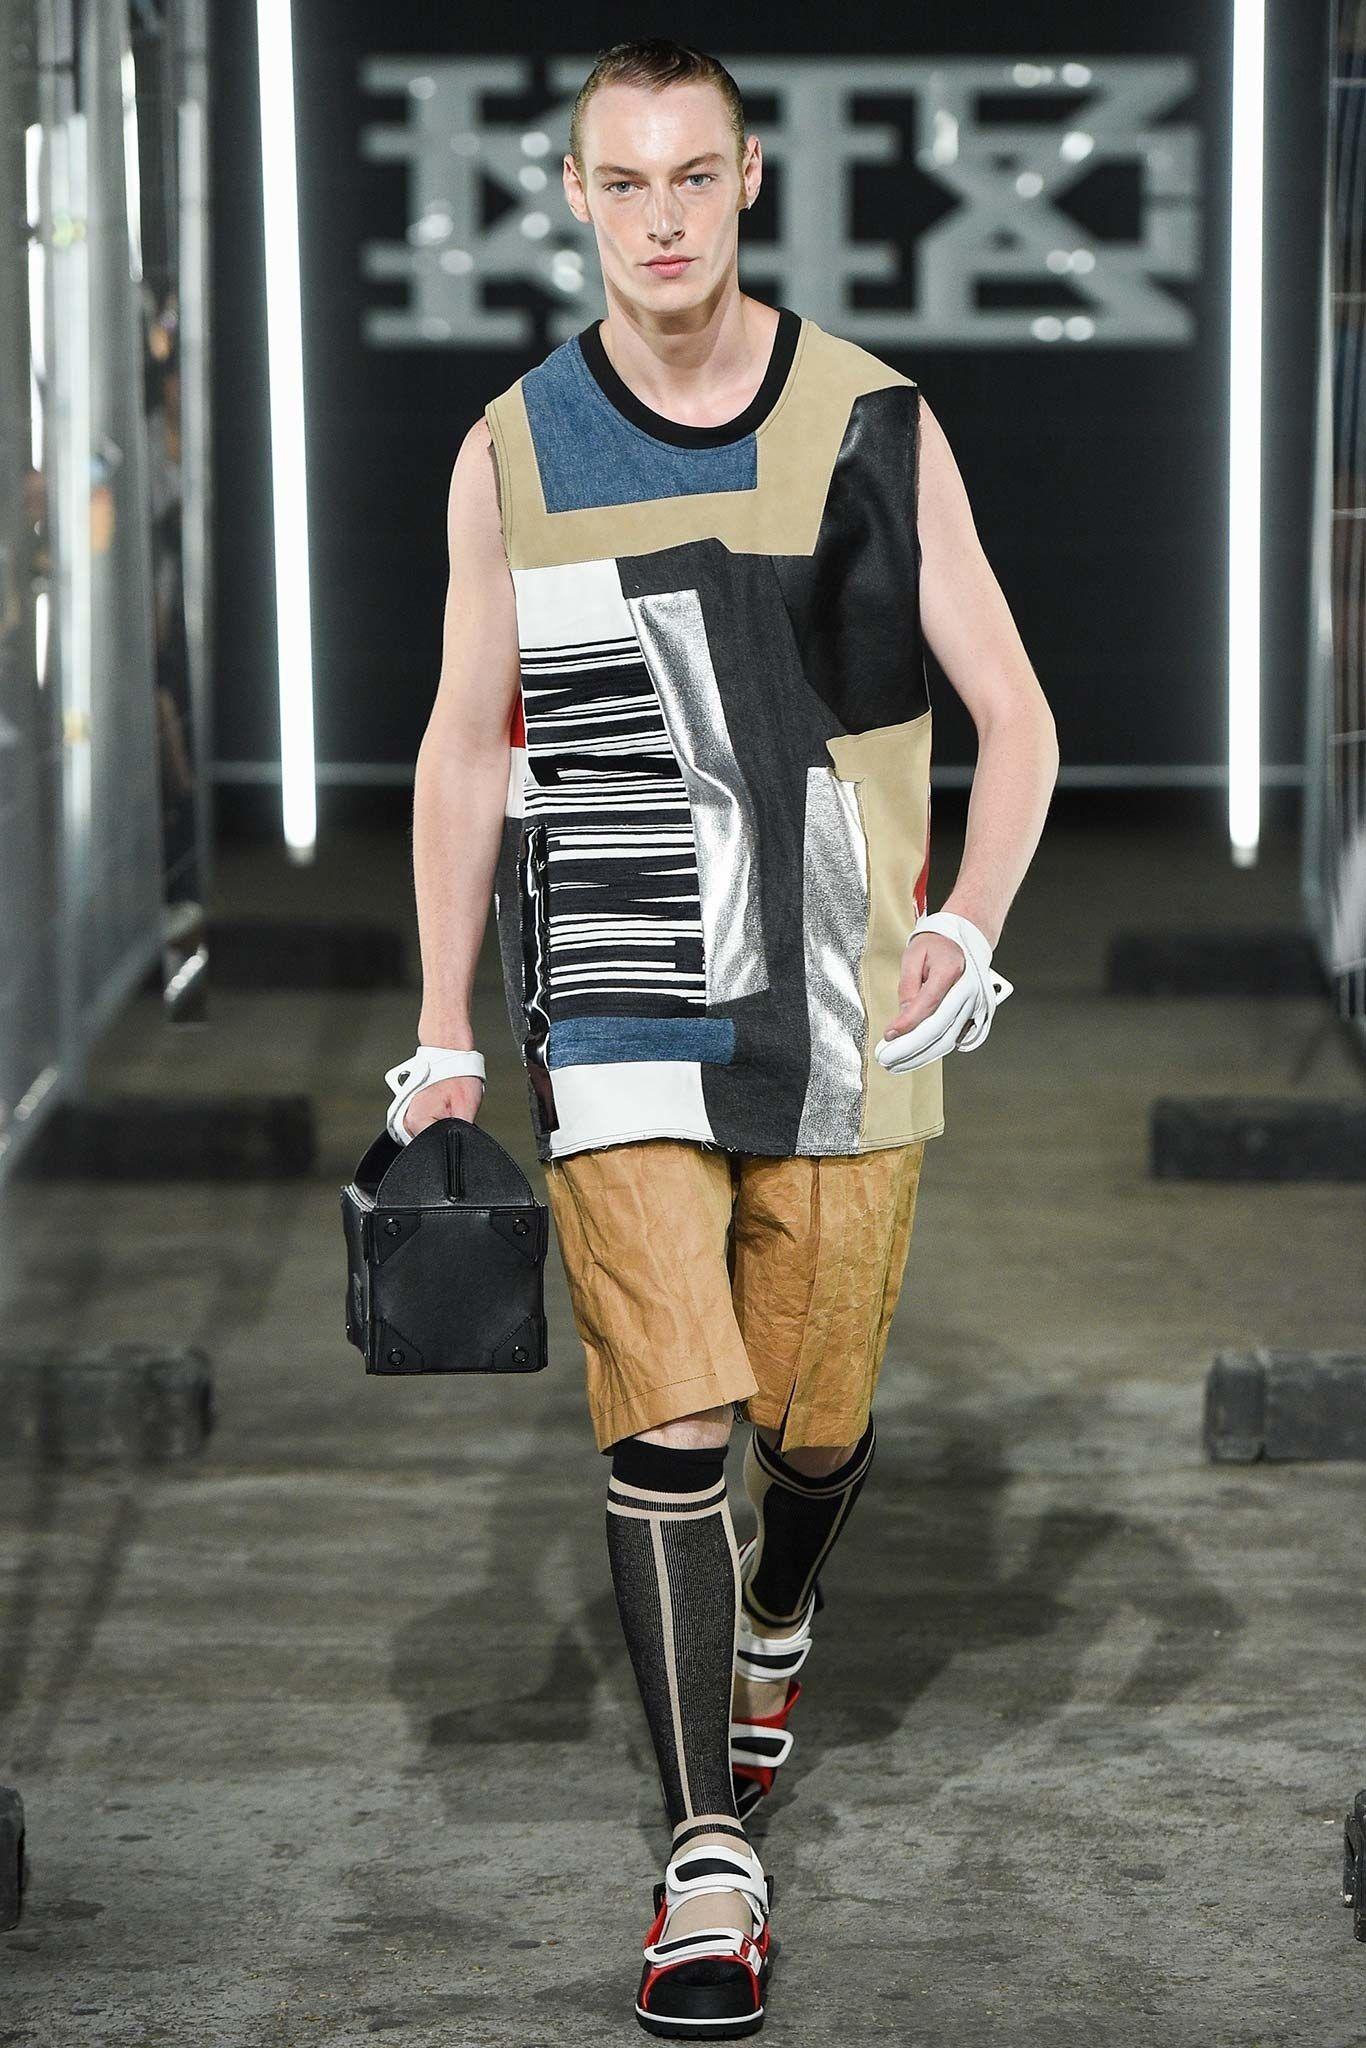 Ktz spring menswear fashion show